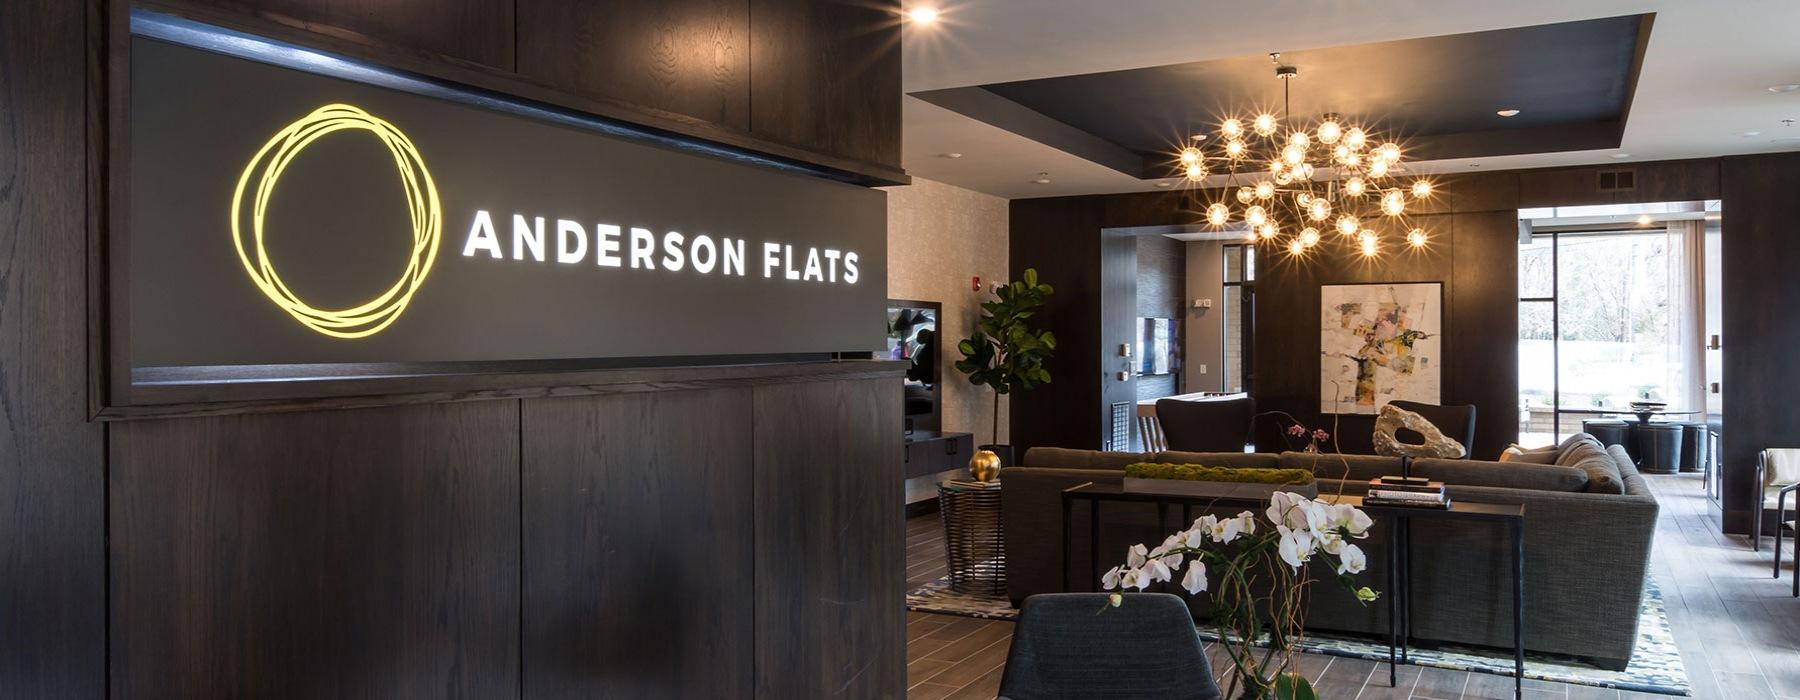 Anderson Flats Reviews